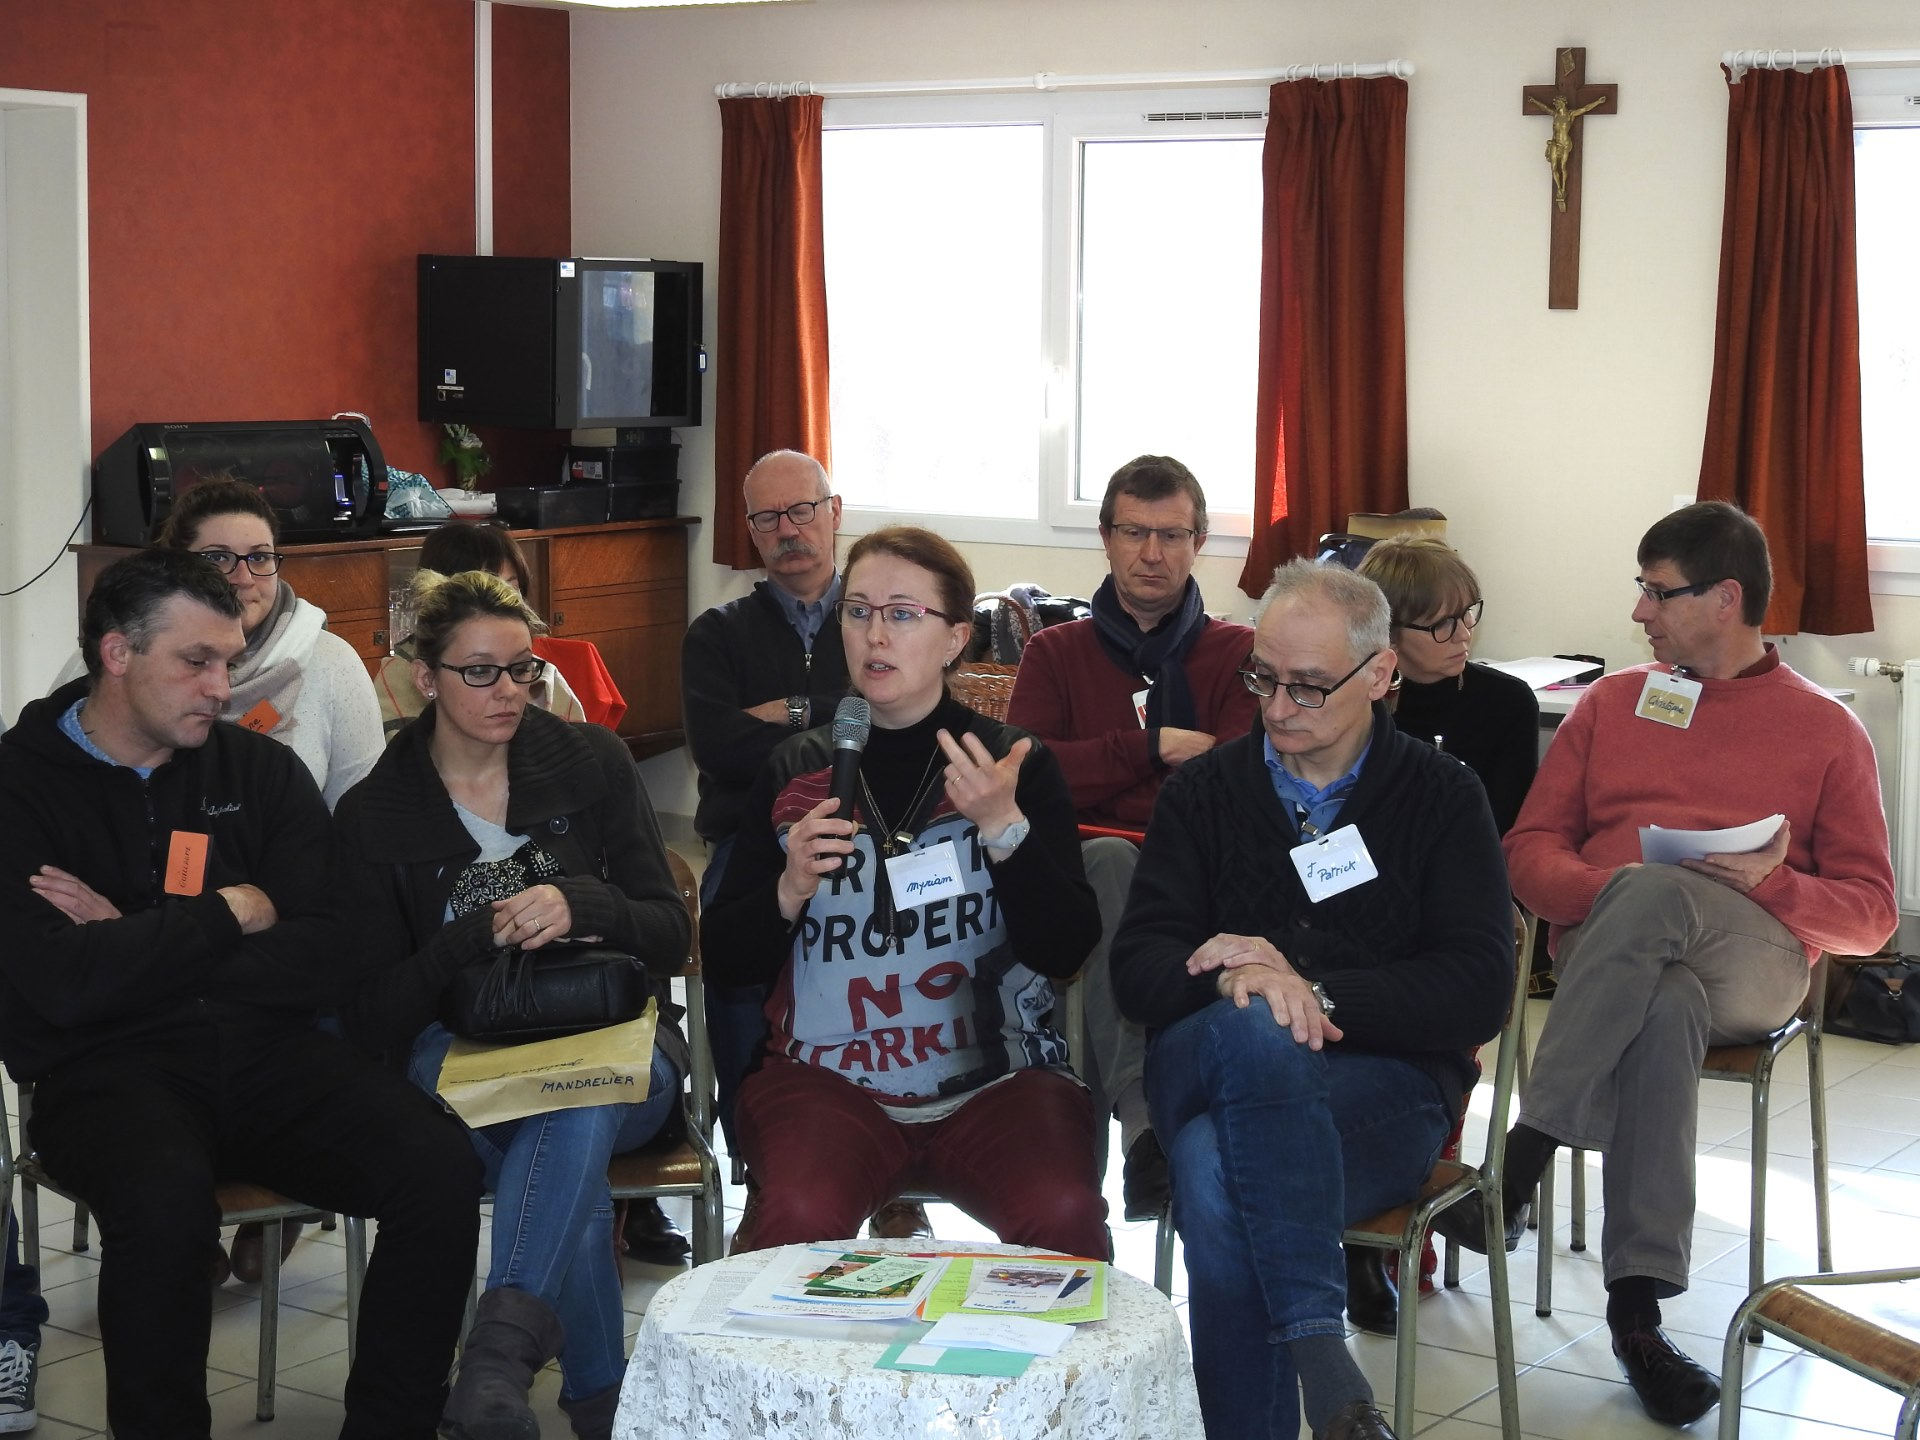 2018_03_18-03-Caudry (59)-Preparation au mariage